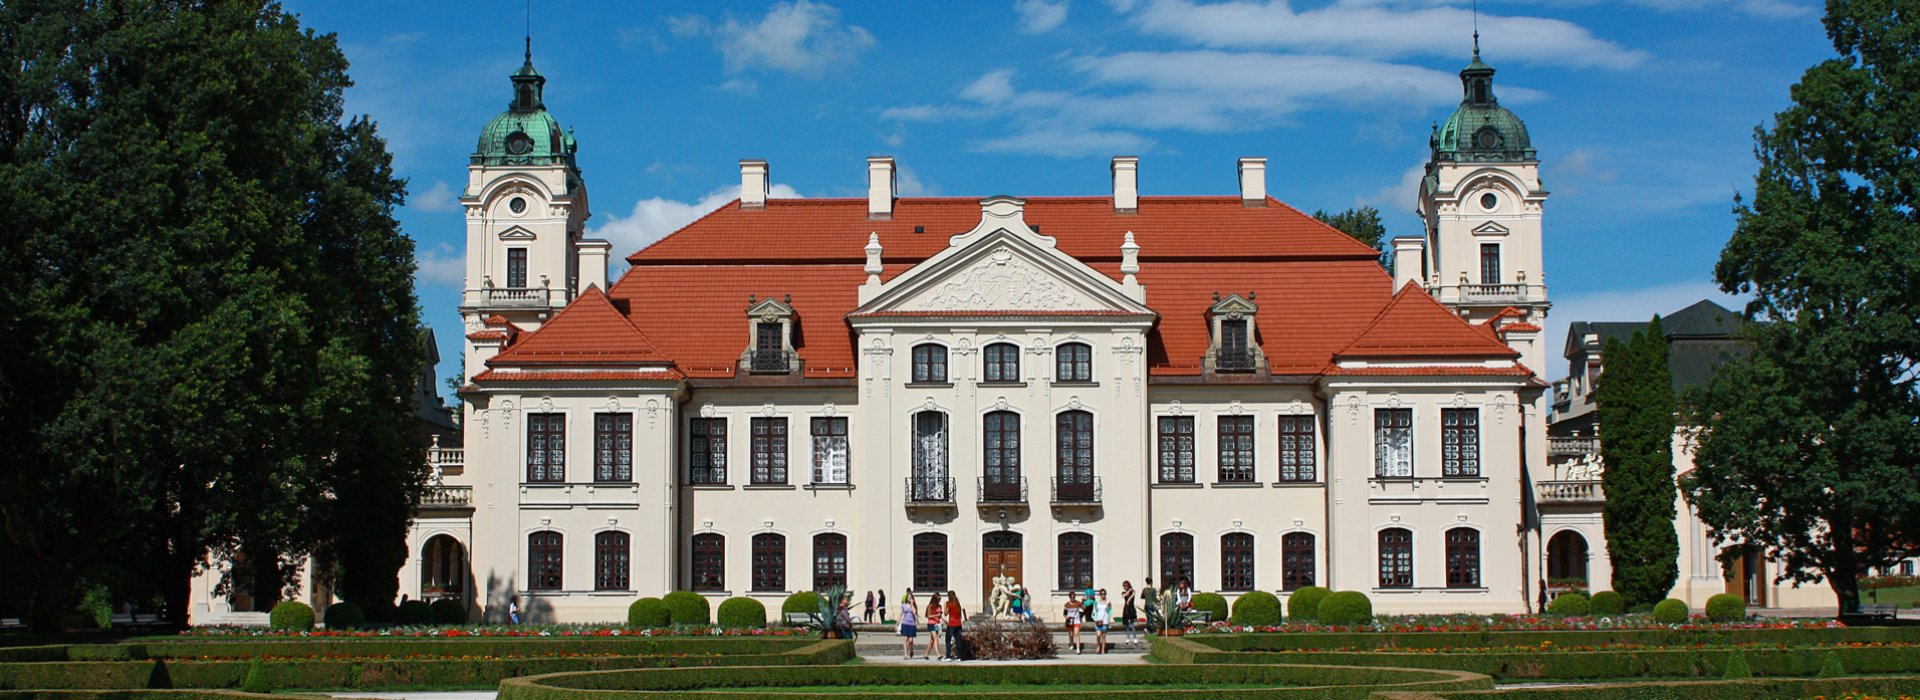 Polish aristocratic residence Kozłówka